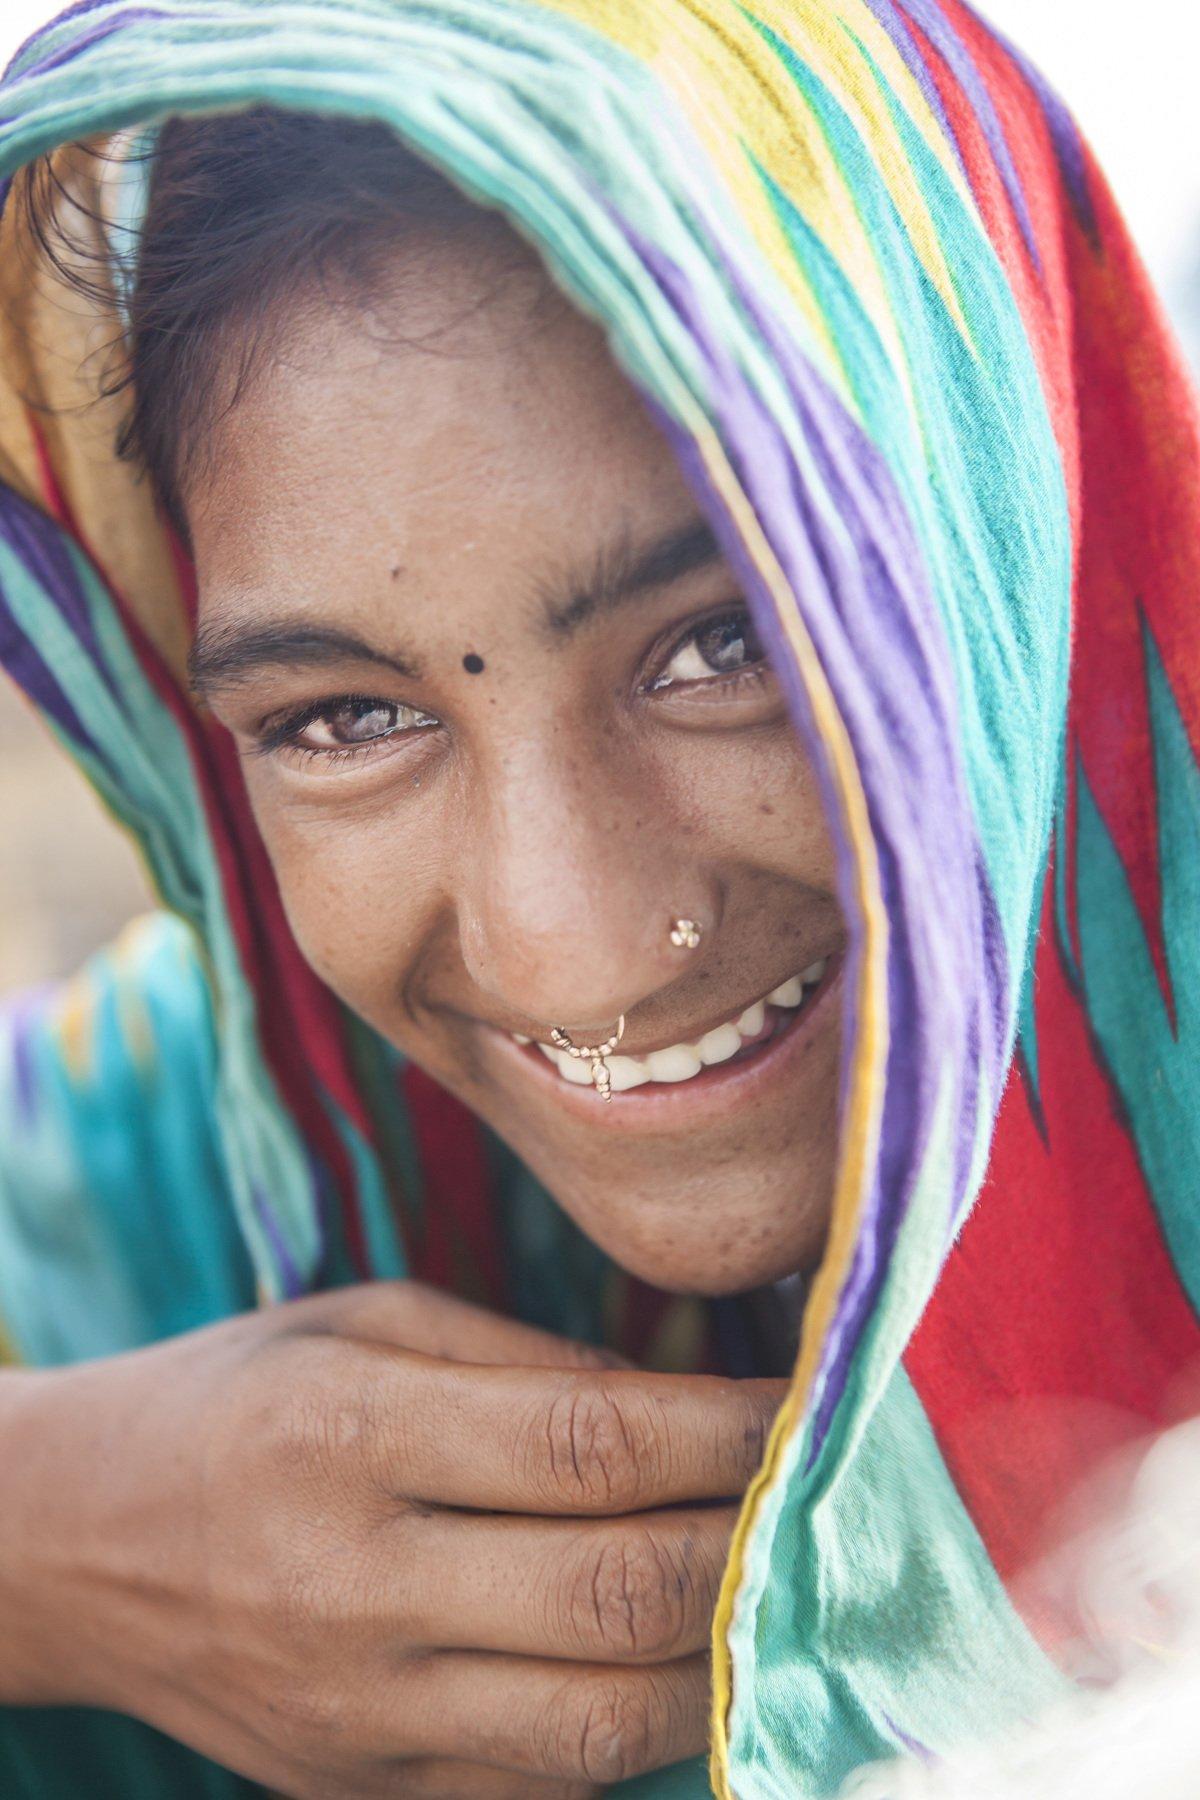 Gobindapaul, Street, Aisa, Urban, child, Bangladeshi_photographer, color,digital, , Gobinda Paul